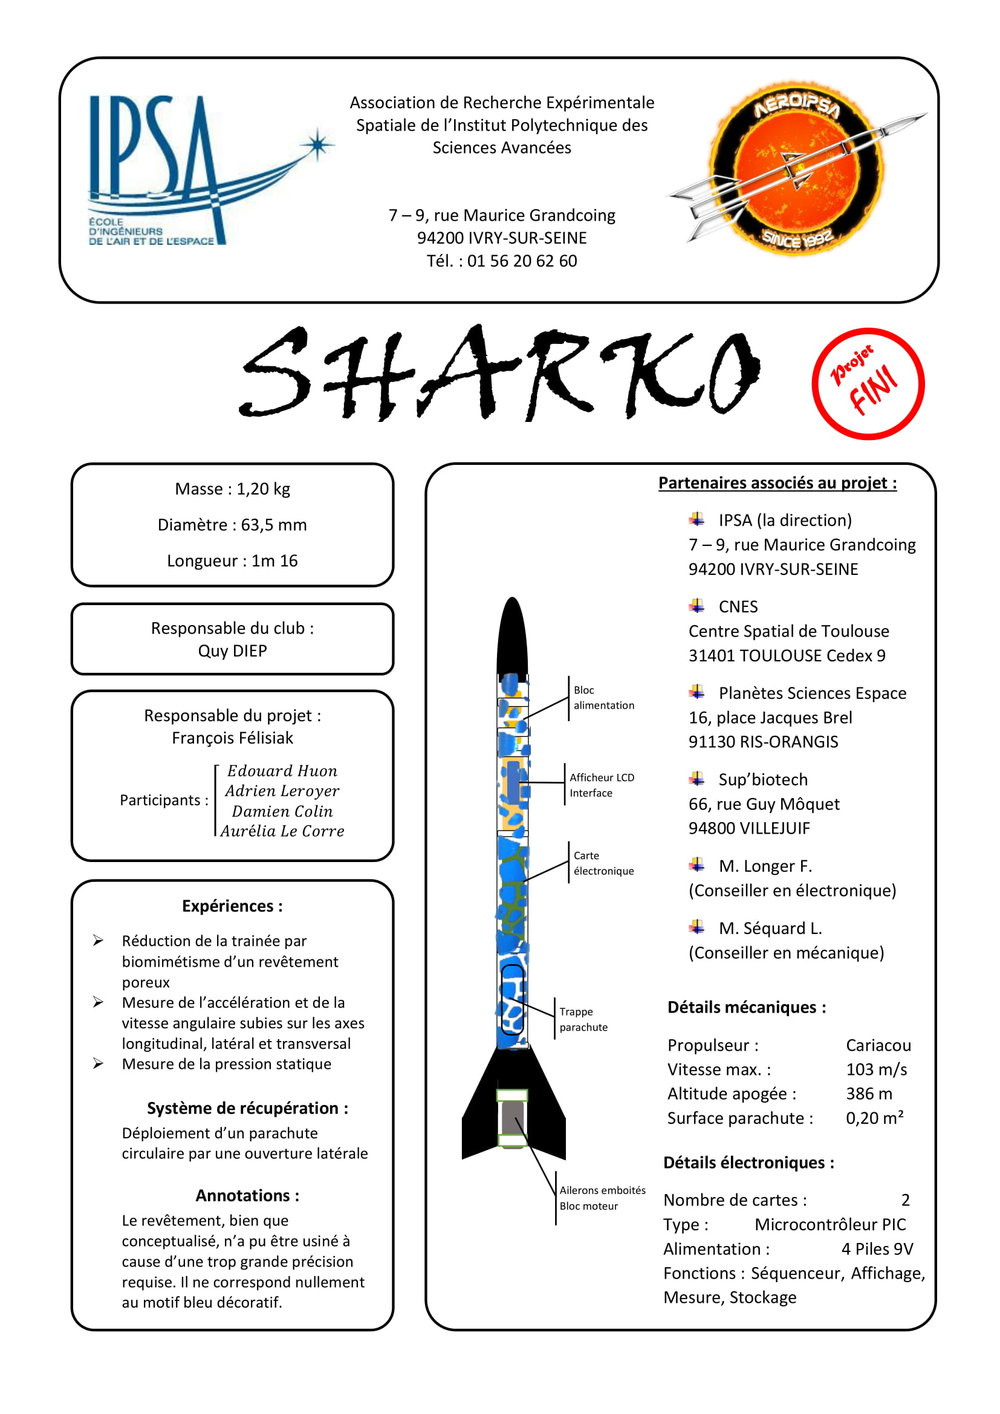 2015 Fiche Signalétique Sharko-1.jpg